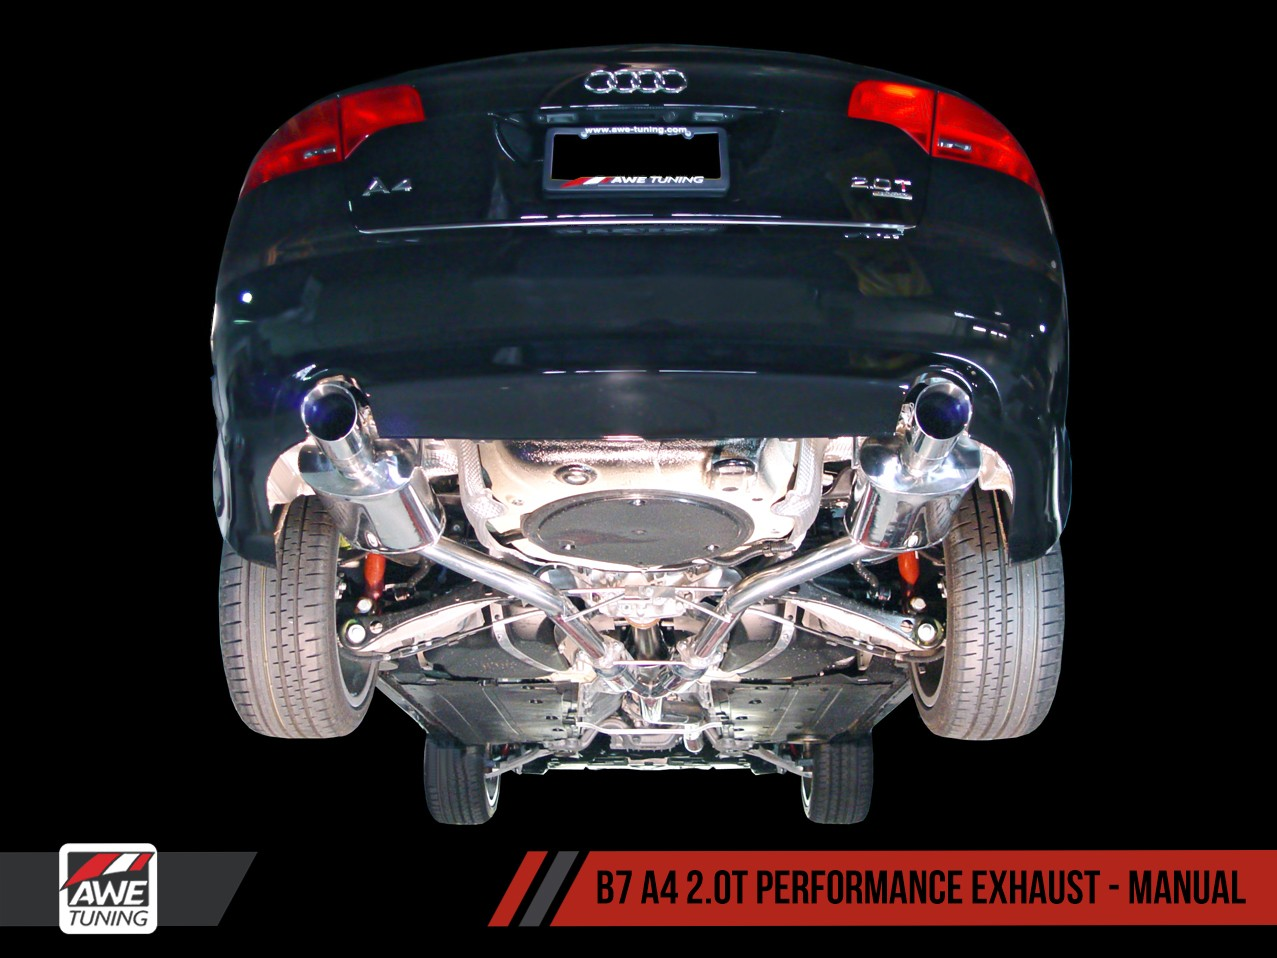 AWE Tuning's Exhaust - Matrix Integrated